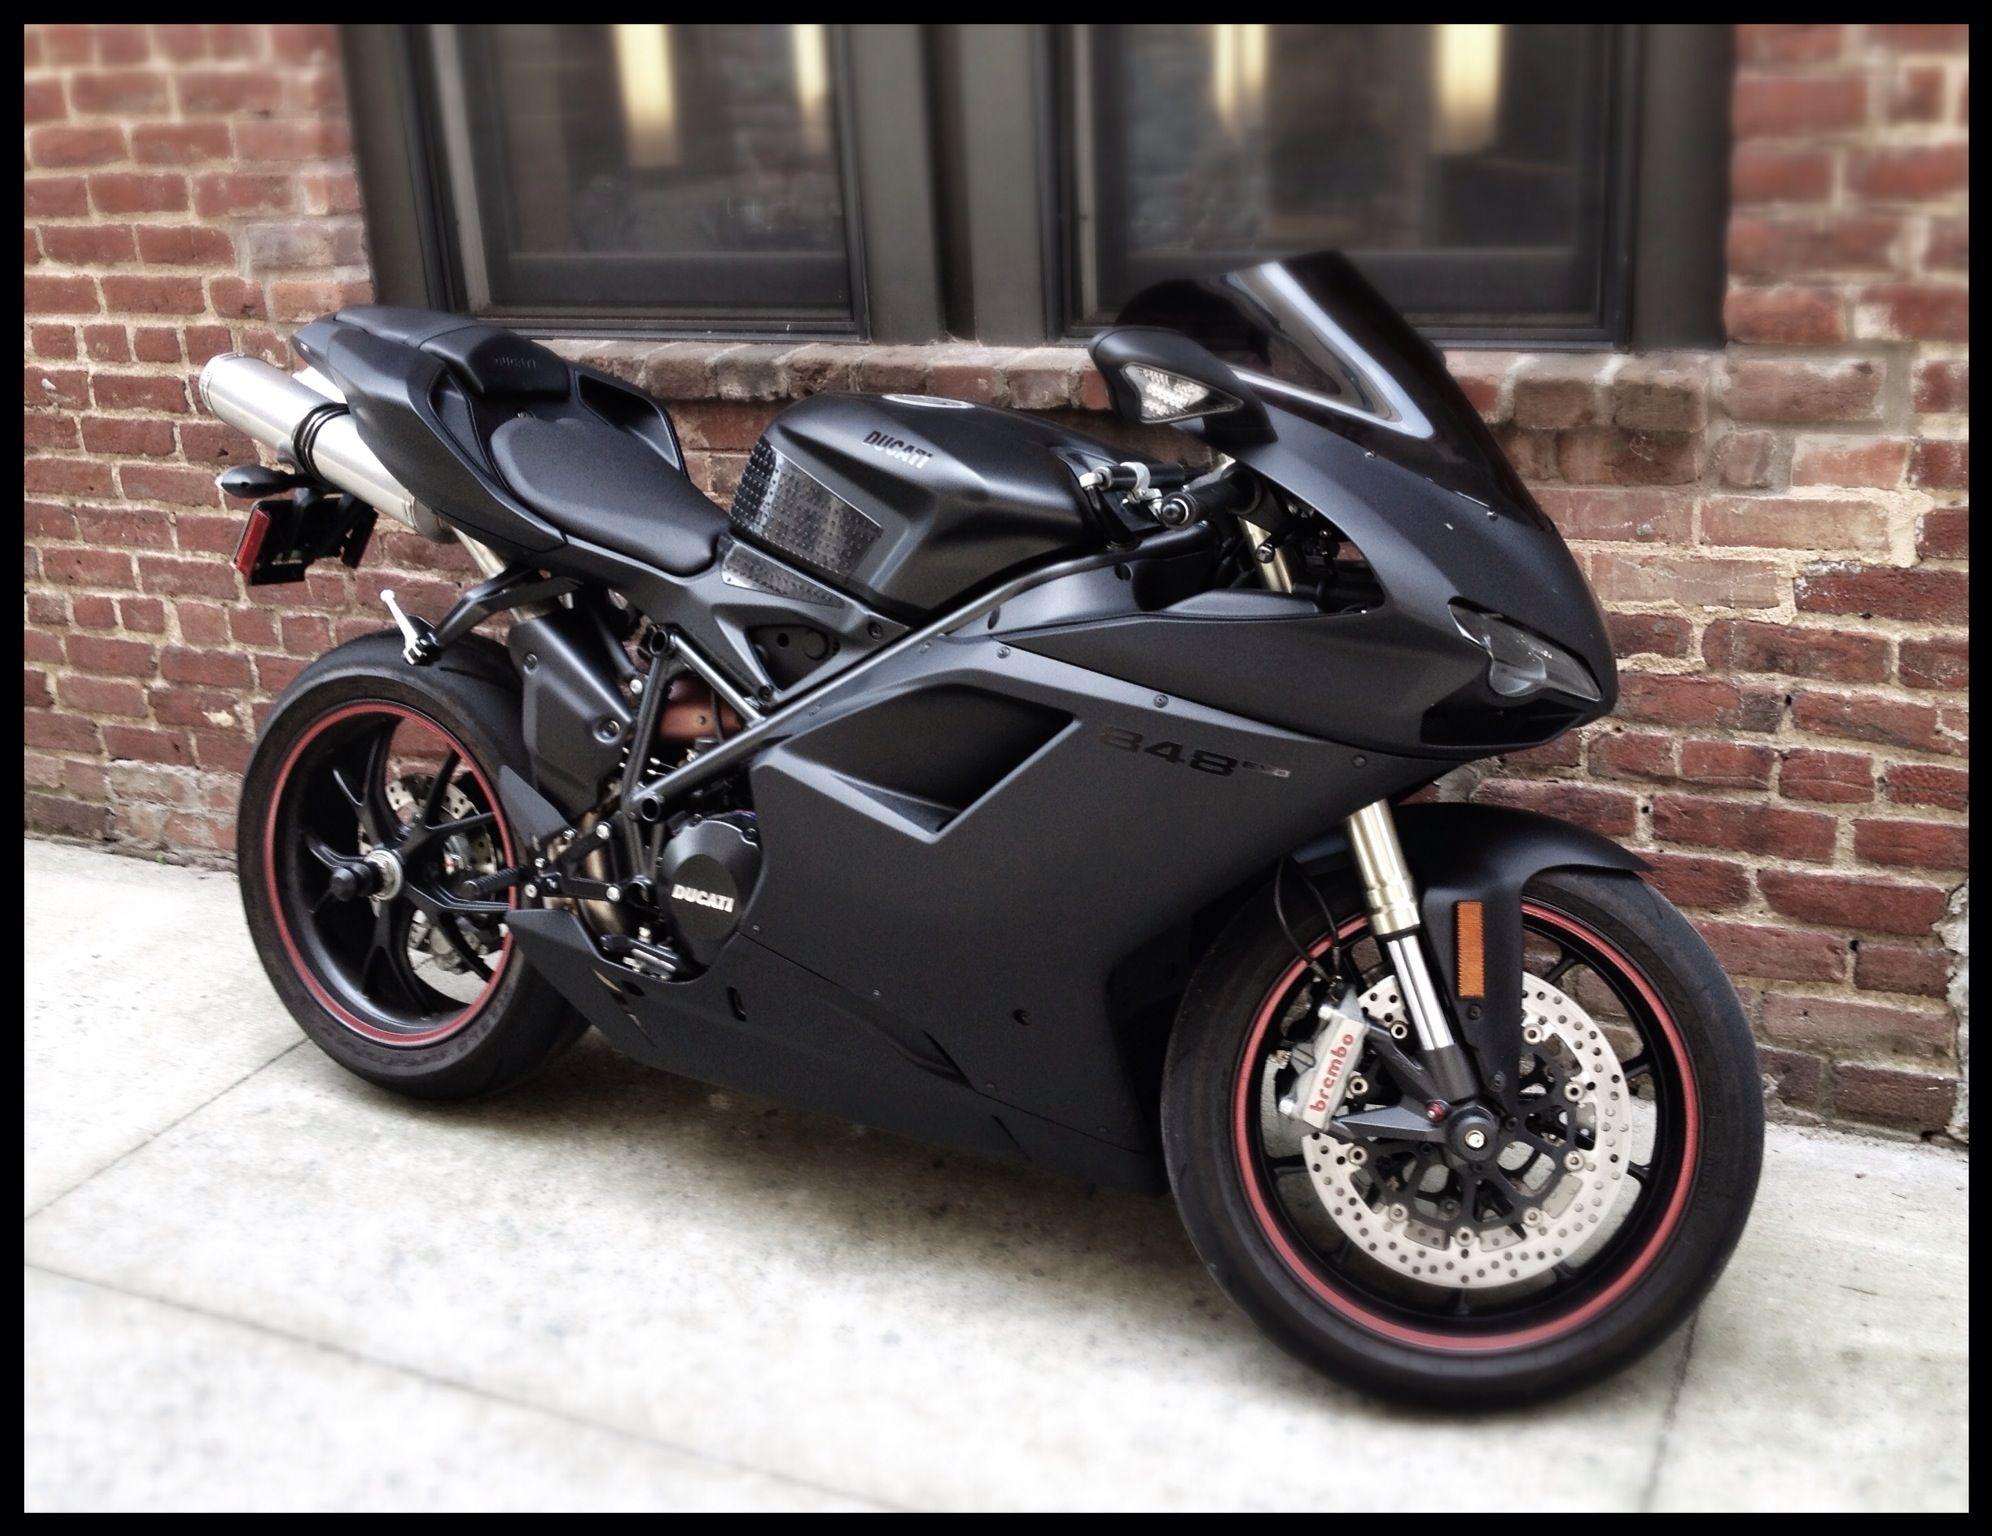 Ducati 848 Evo Automobilia Pinterest And Bike Hypermotard 796 Engine Diagram Valve Motorcycles Cars Hot Bikes